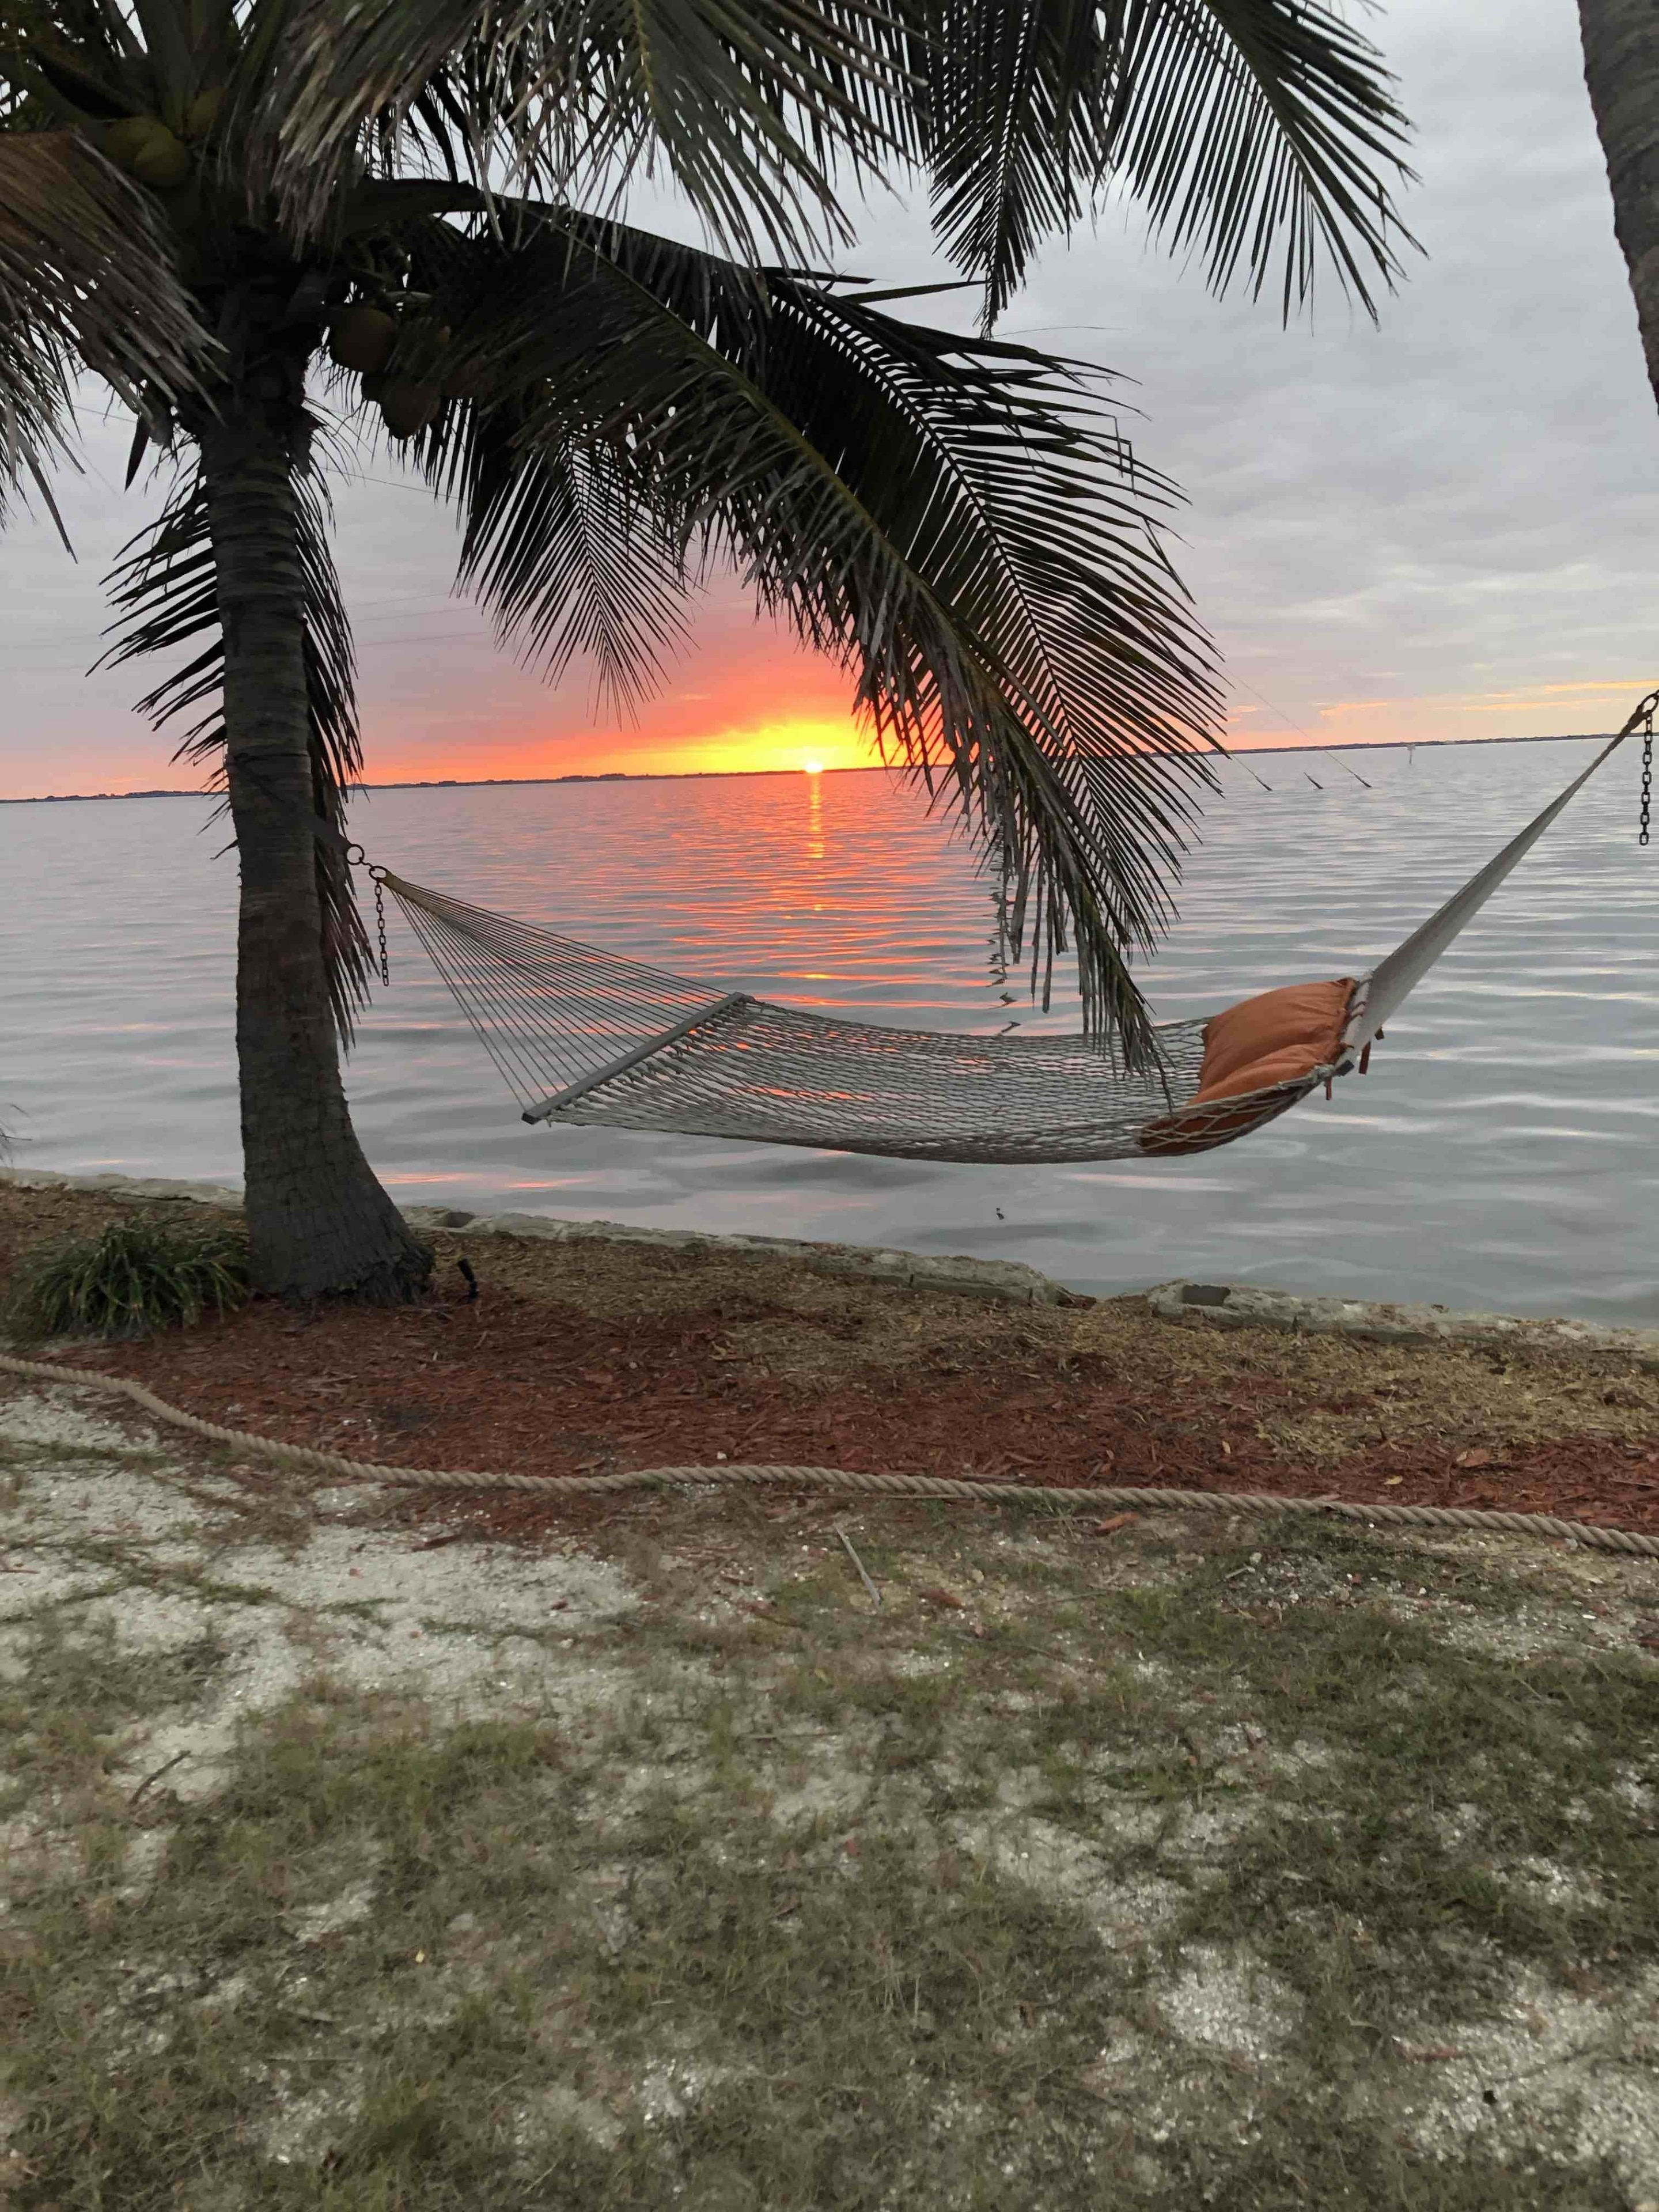 Orlando Beach, Cocoa Beach, Florida, United States of America